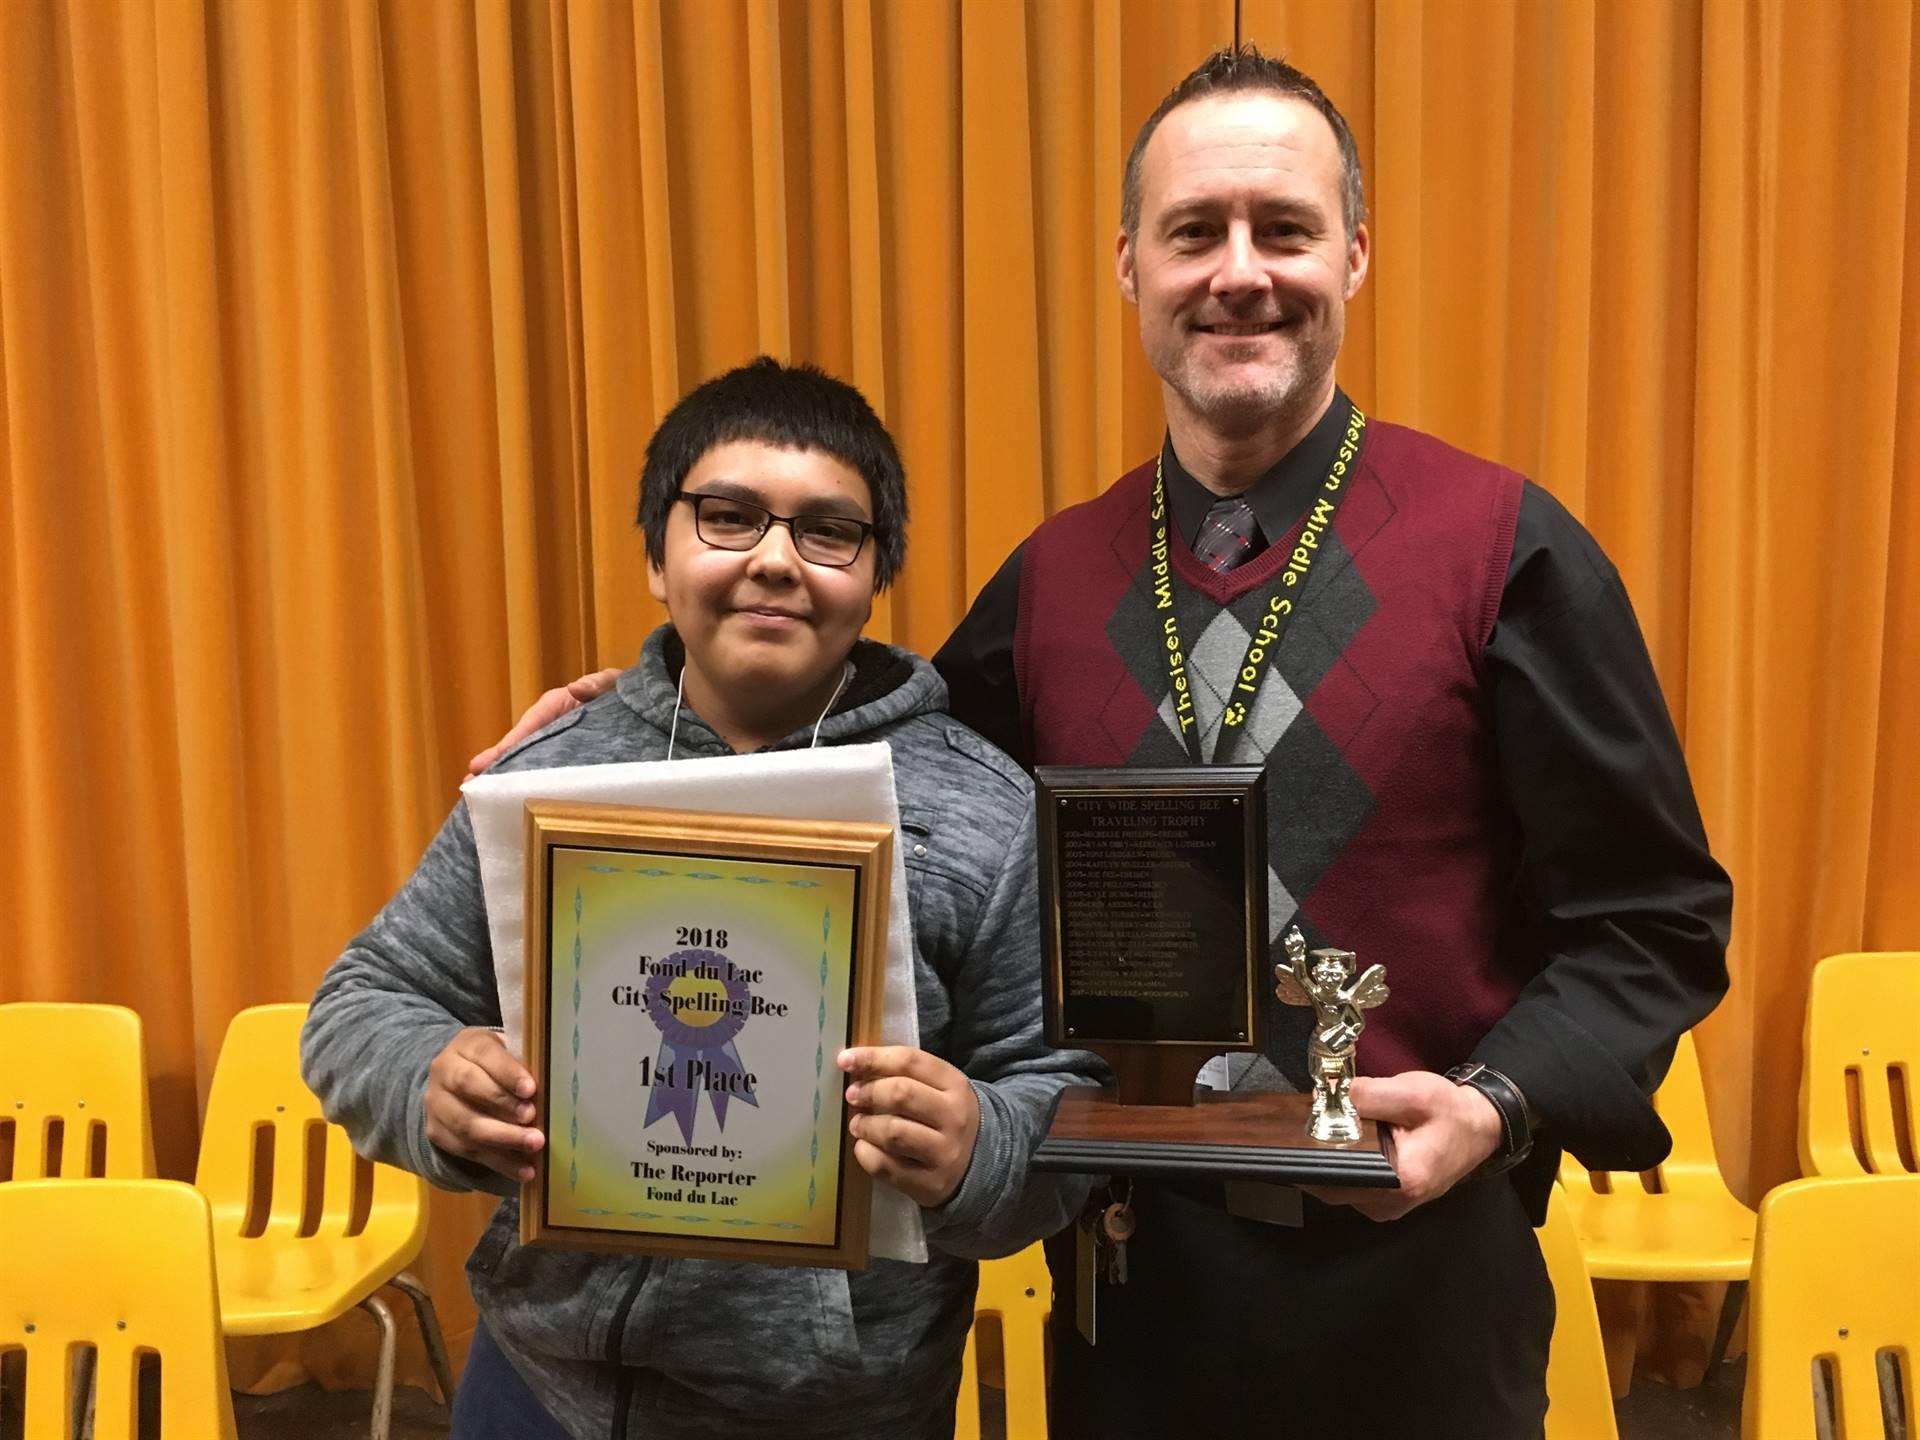 City Wide Spelling Bee Winner and Principal